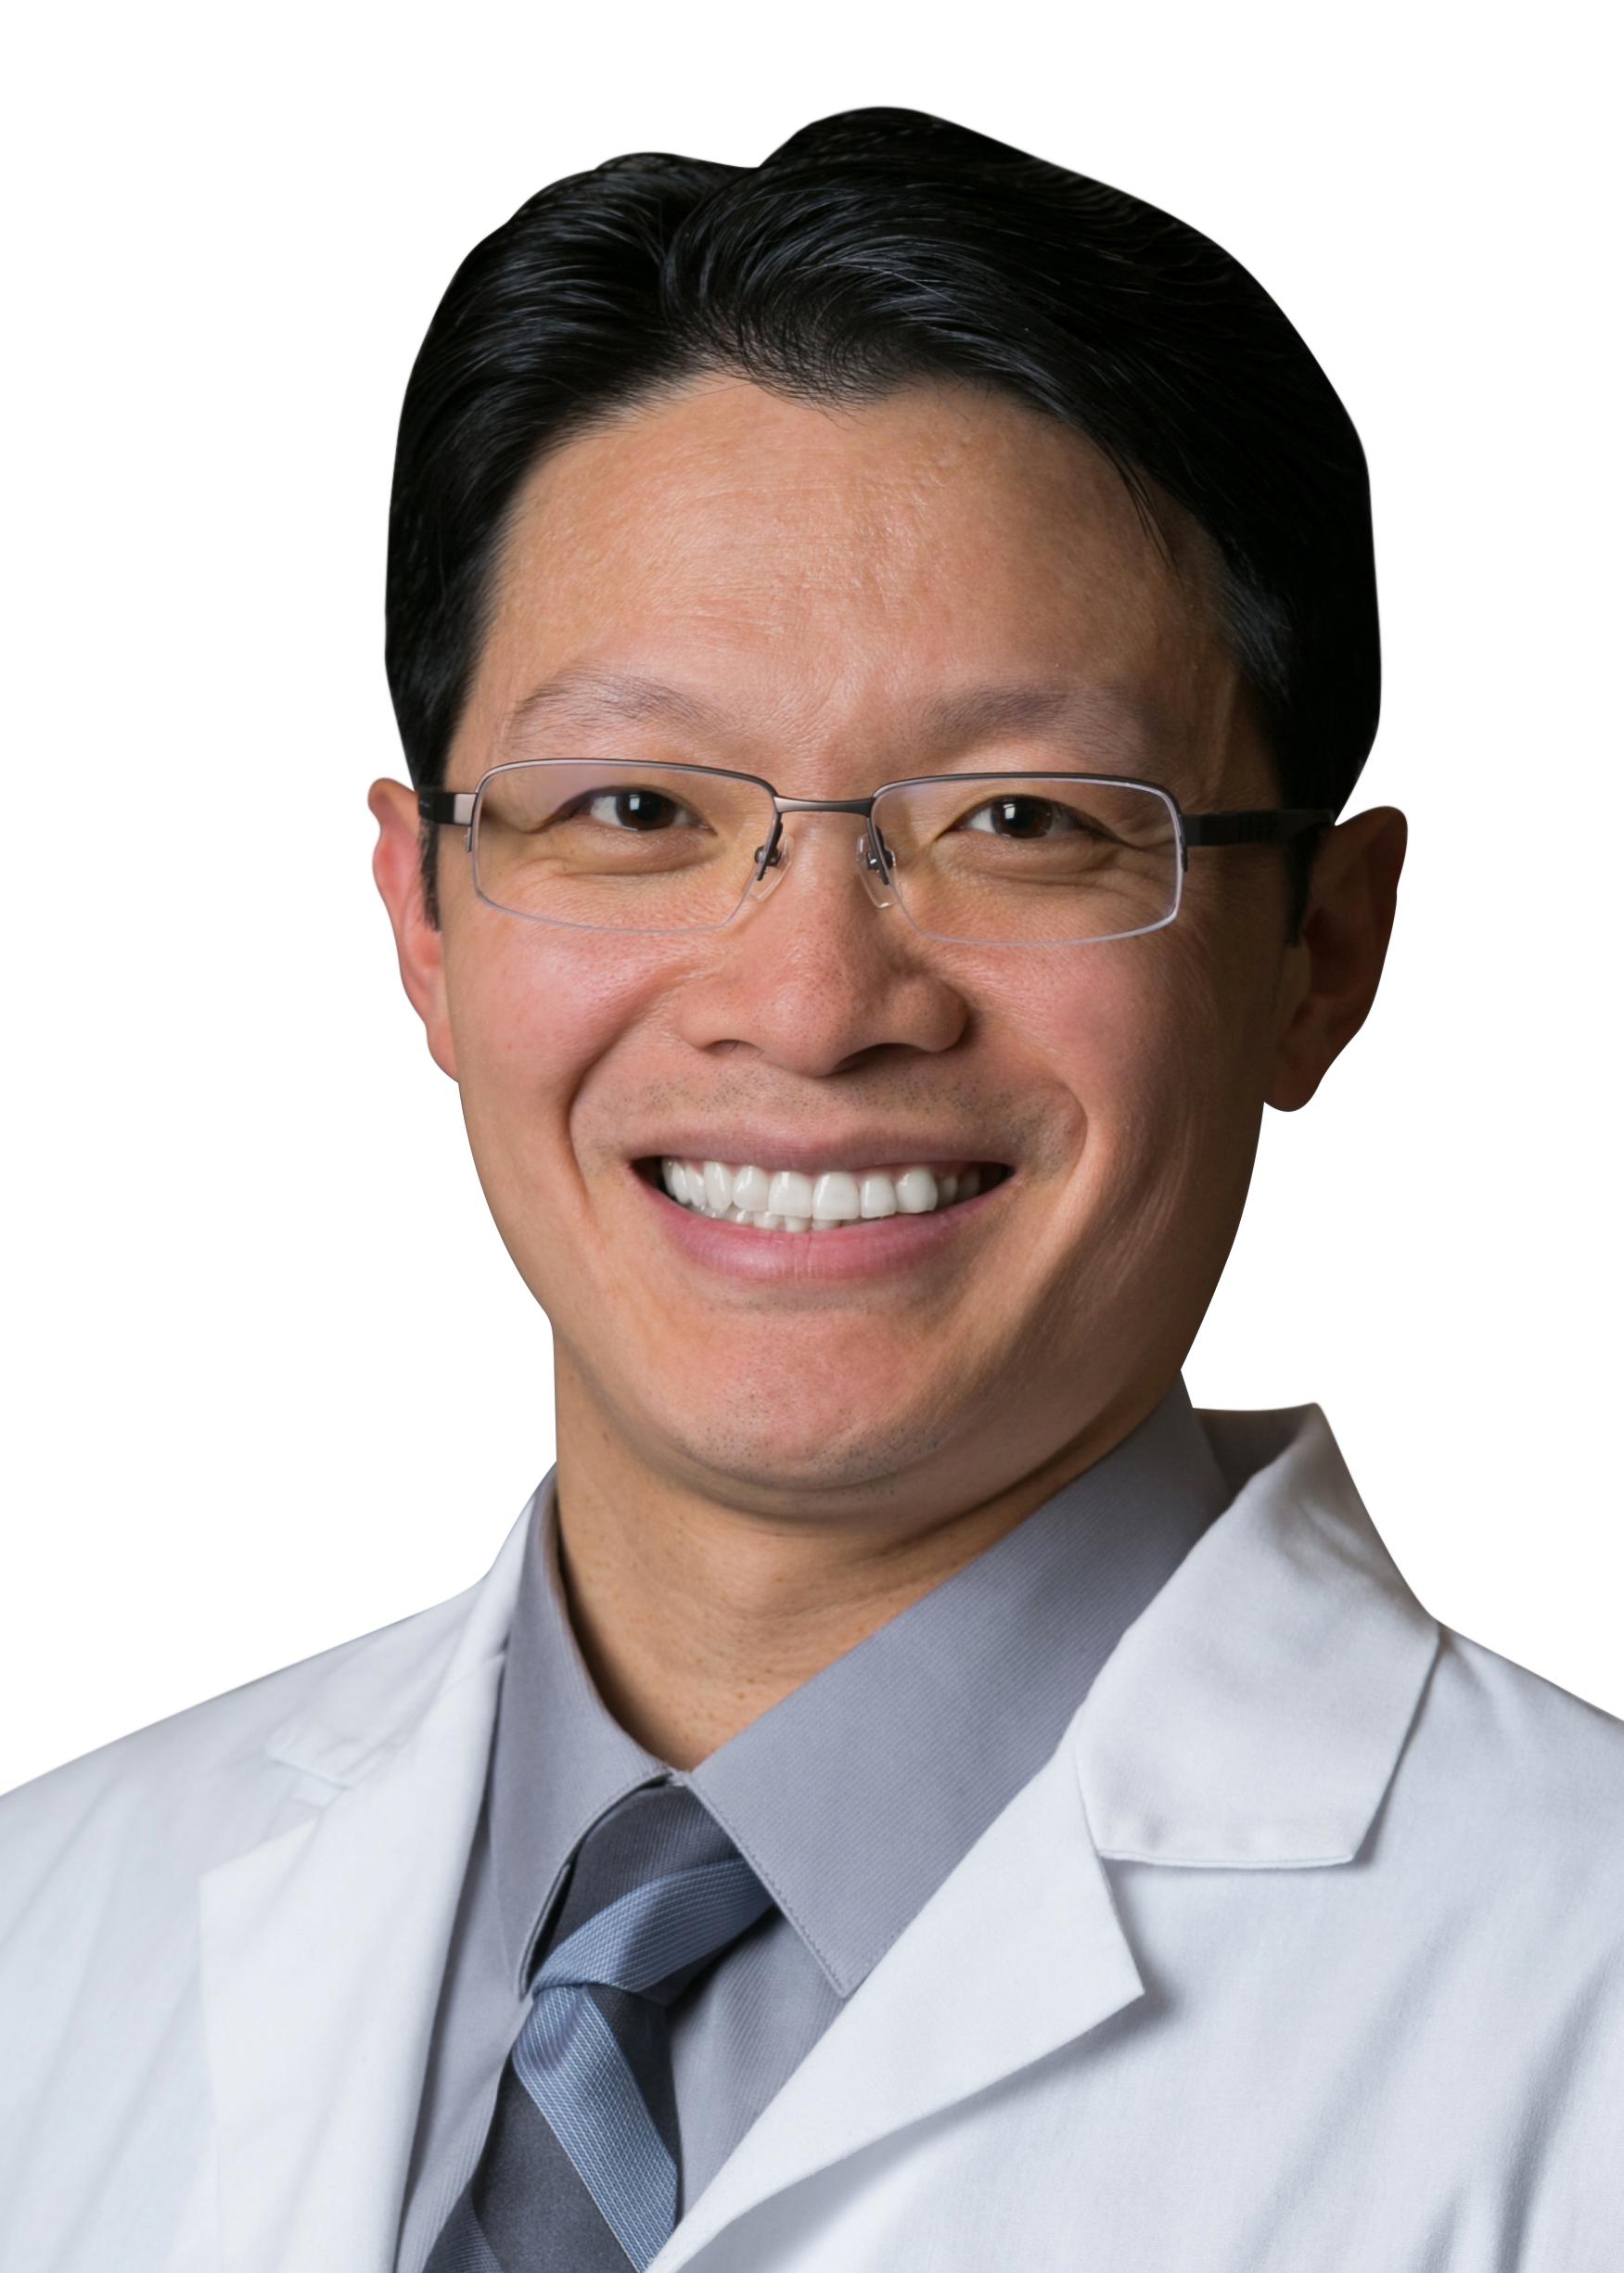 Thomas Yu, M.D. - CHIEF MEDICAL OFFICER